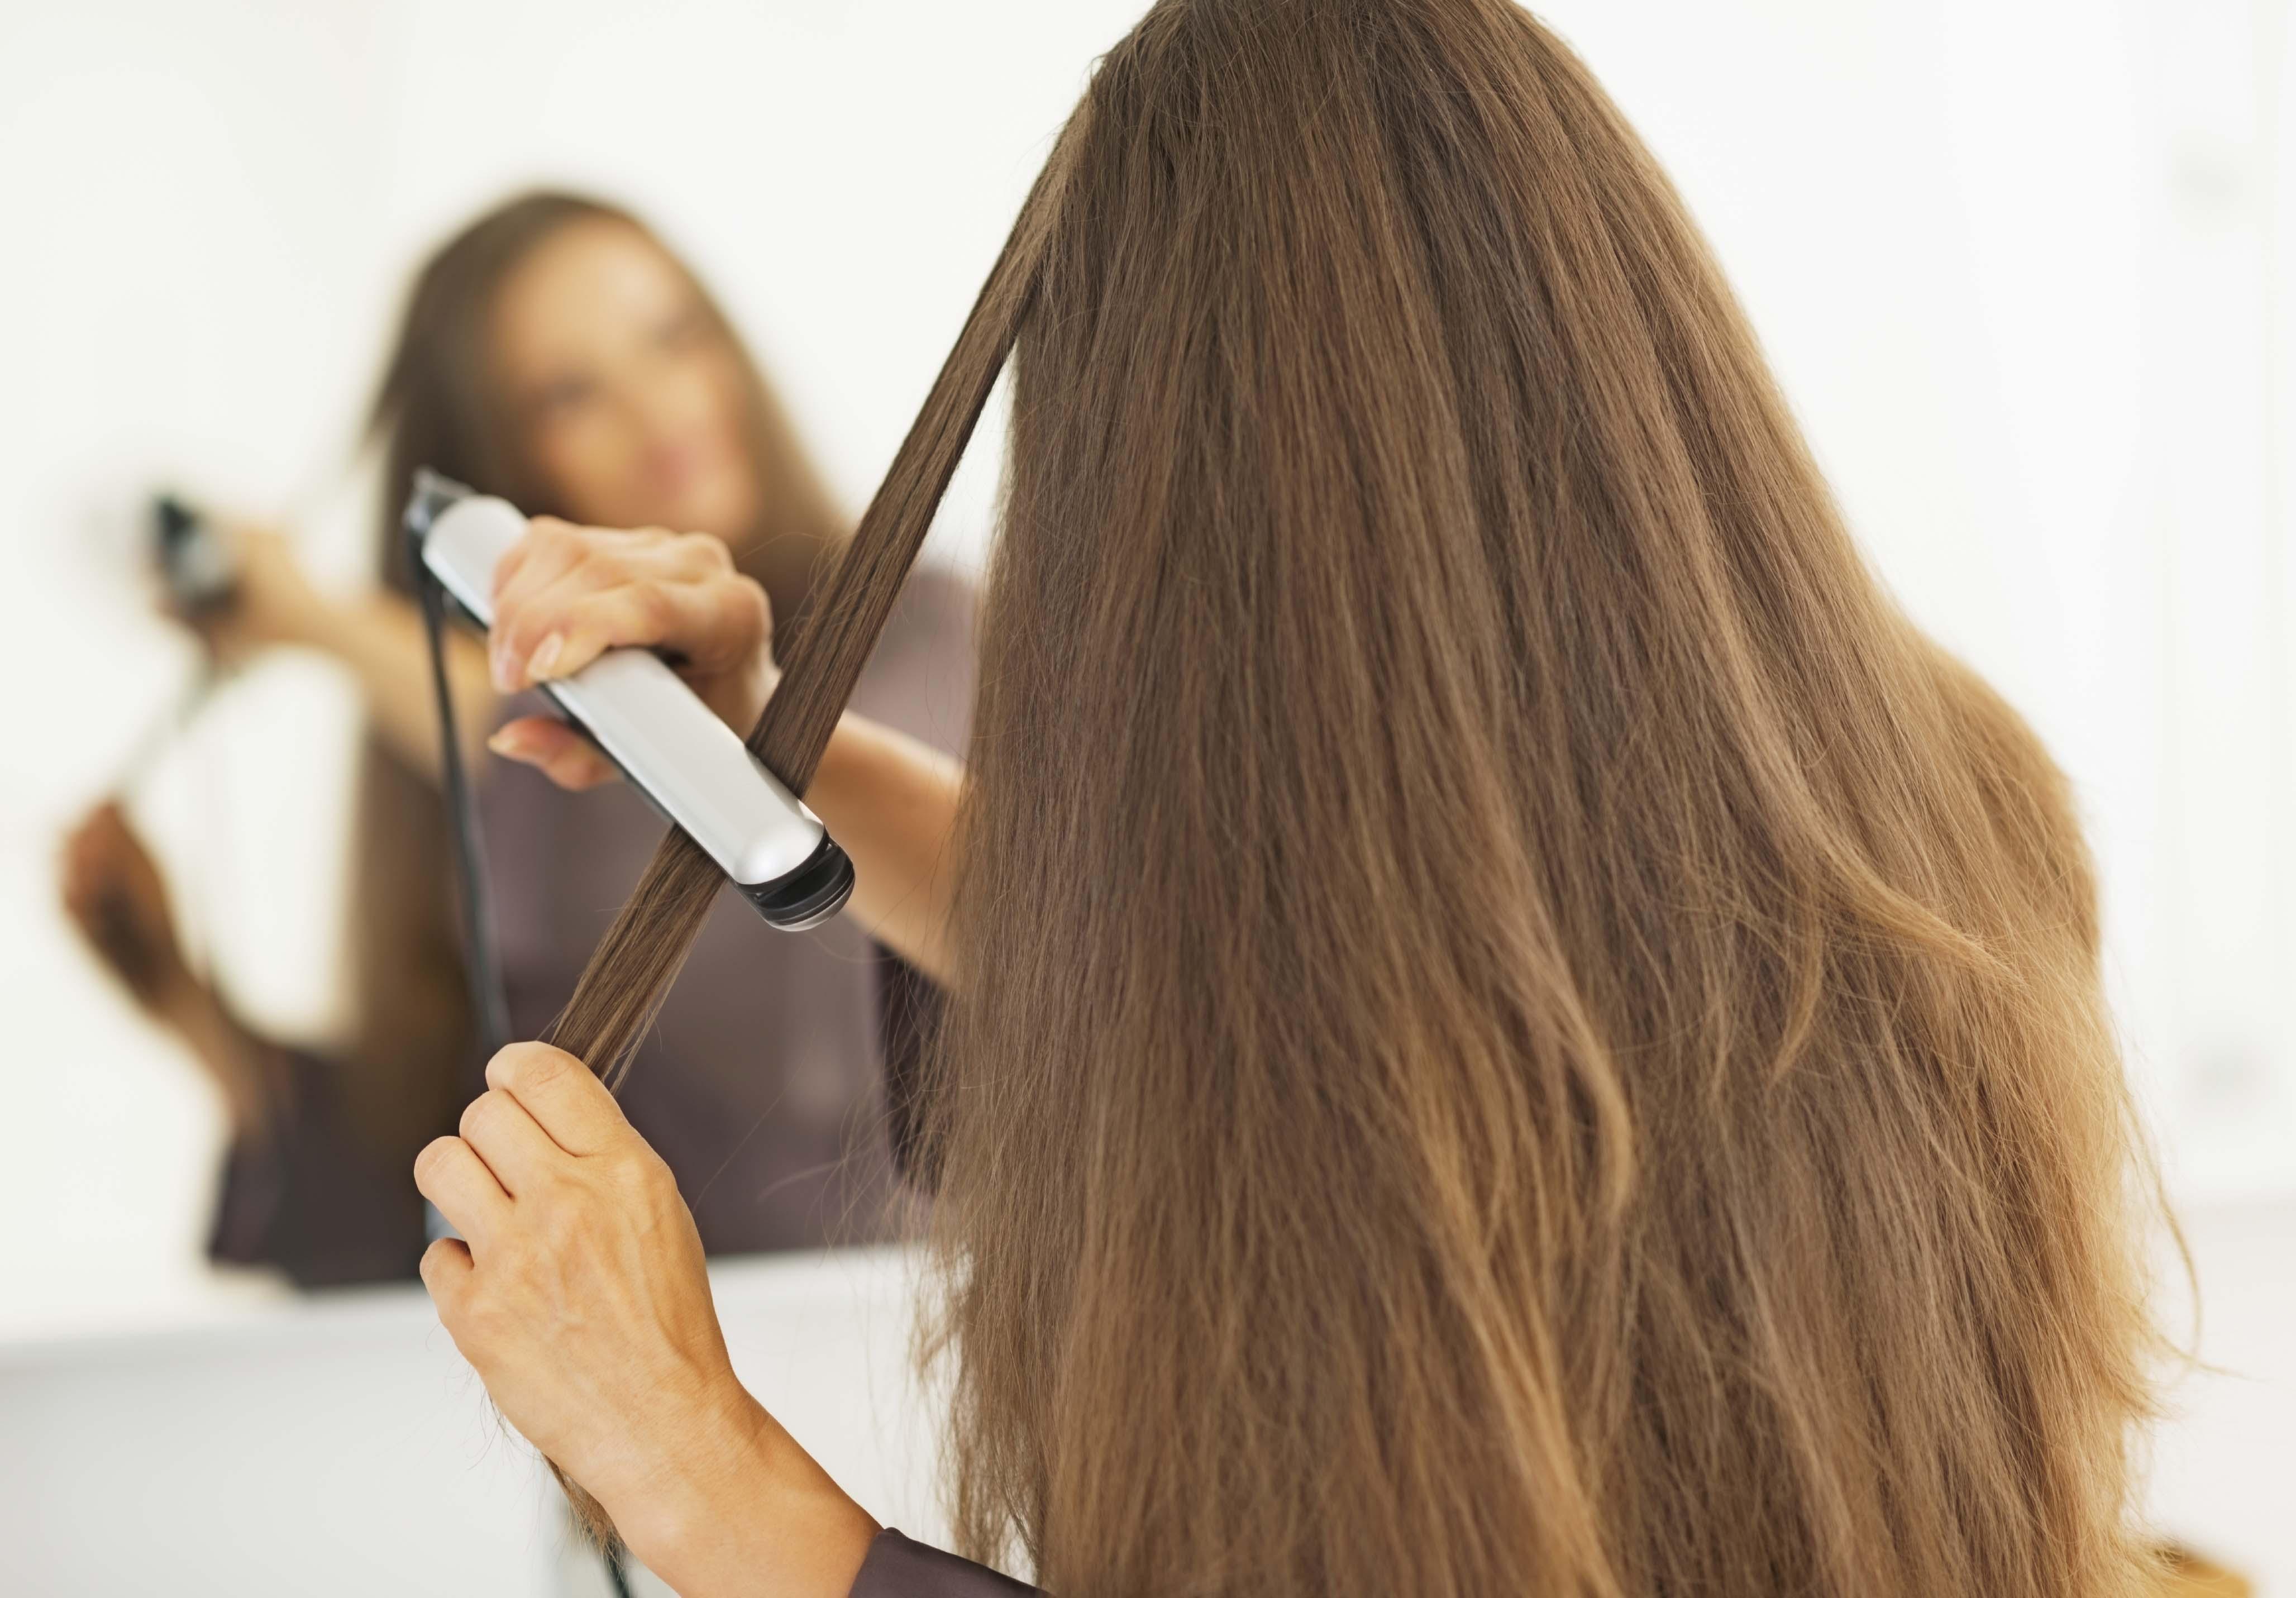 straight-womens-hair-damage-dry-hair